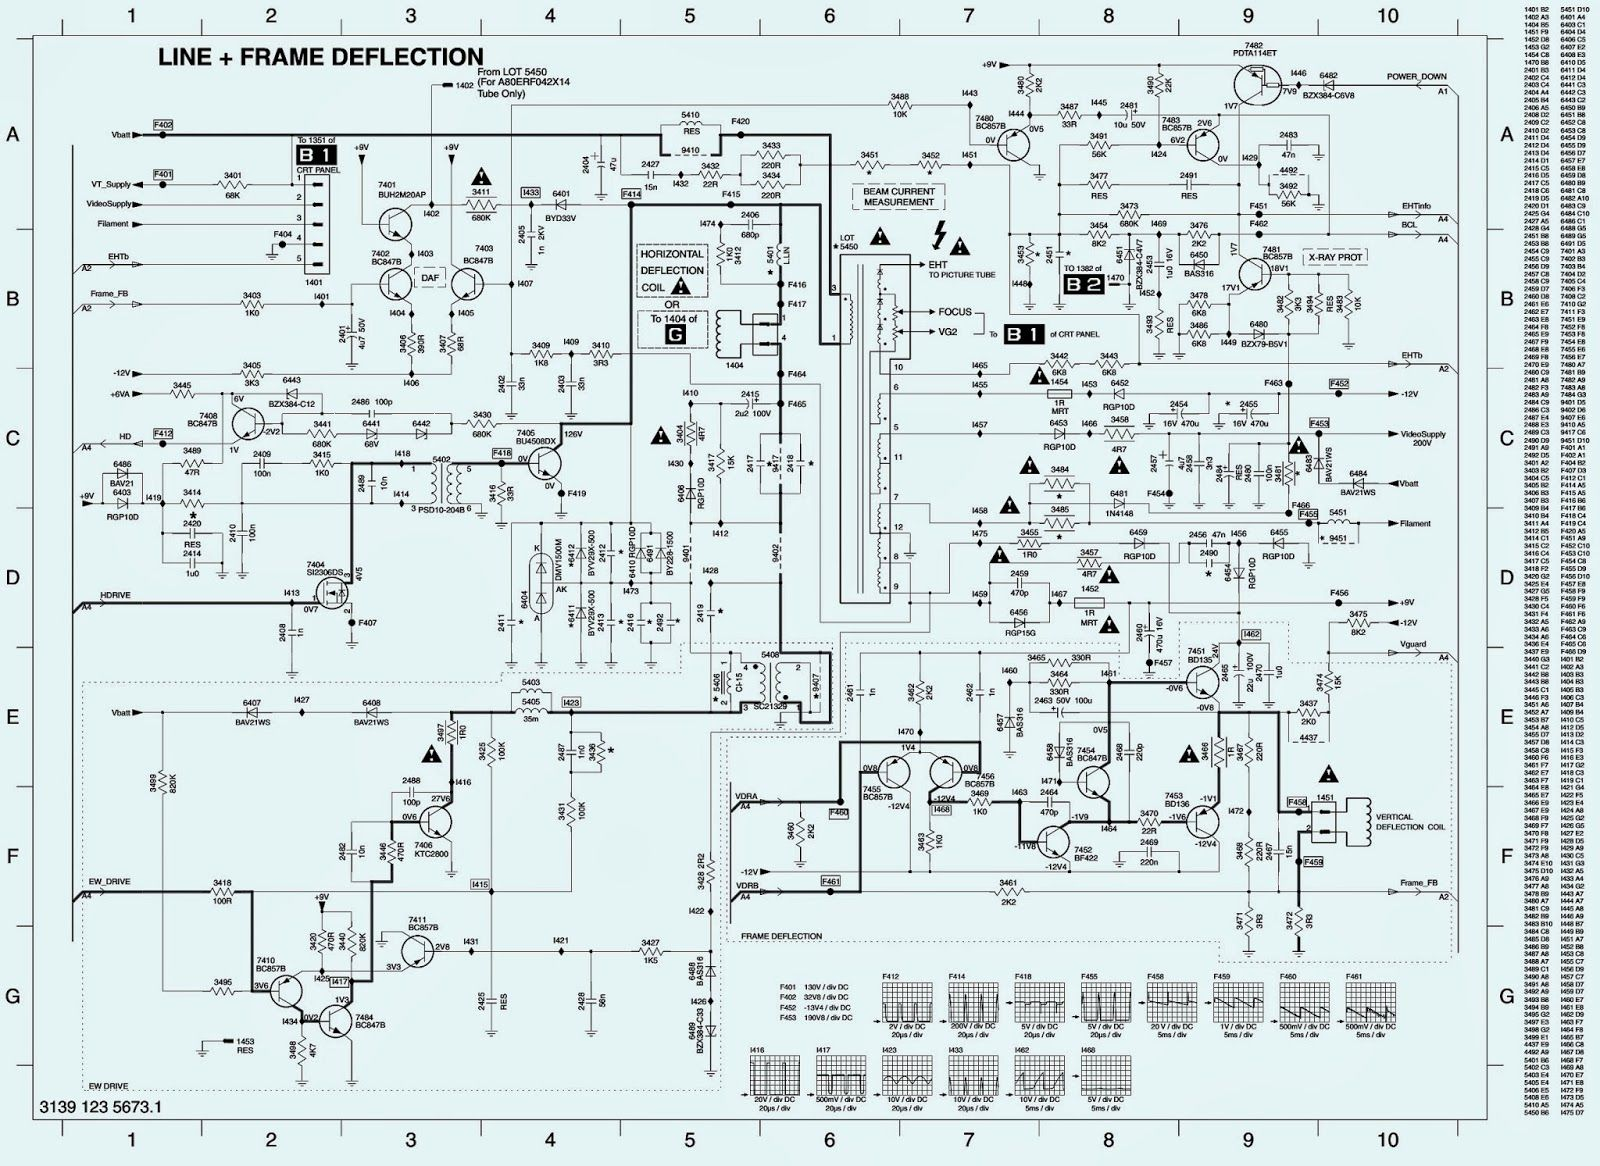 sansui tv circuit diagram free download - circuit diagram images